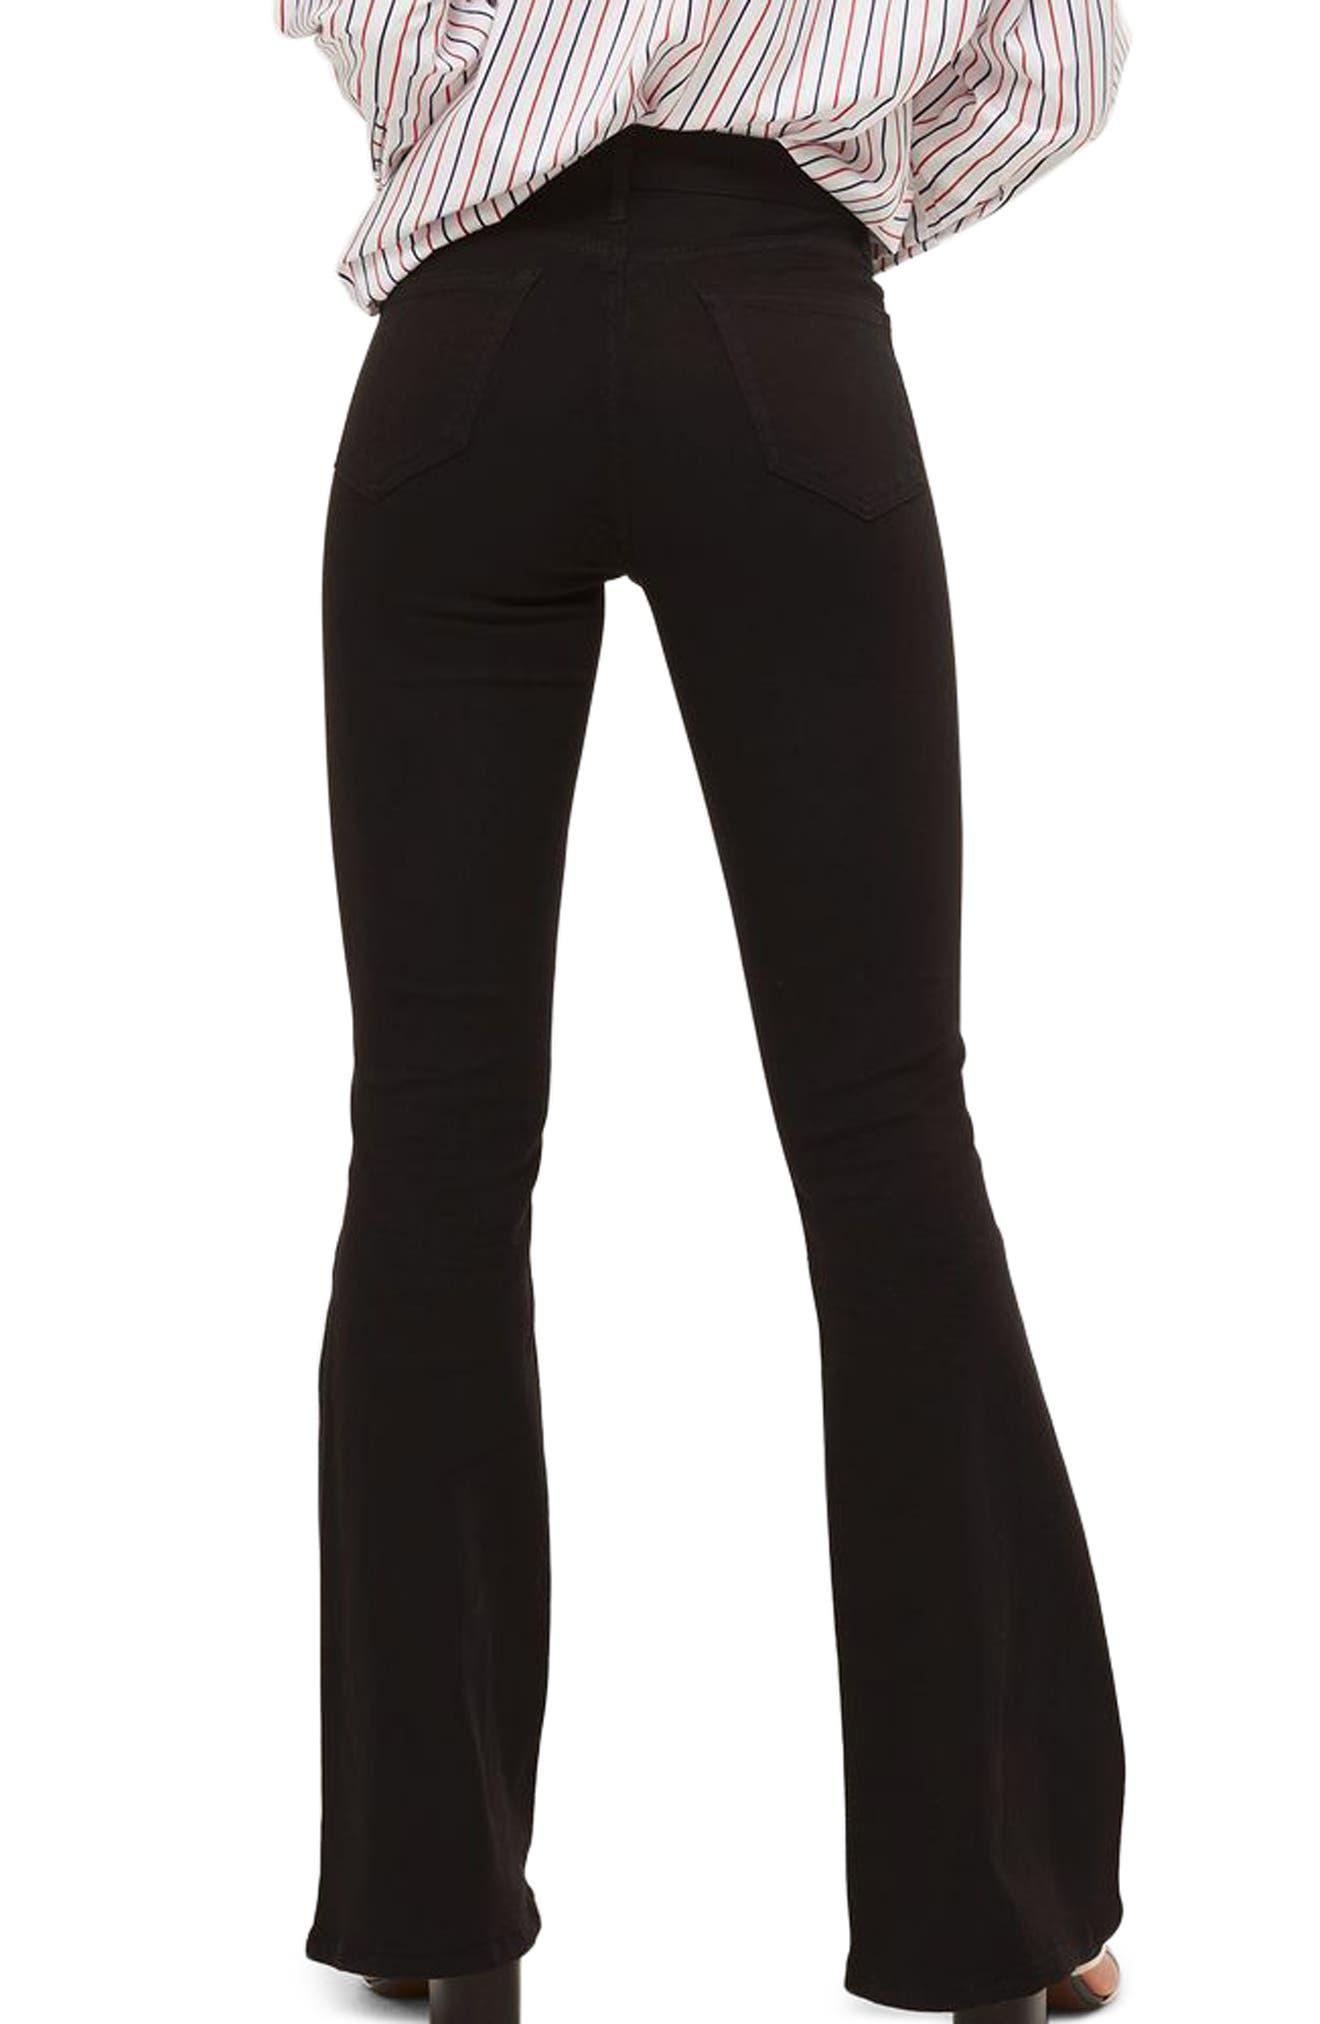 Jamie High Waist Flare Jeans,                             Alternate thumbnail 2, color,                             001